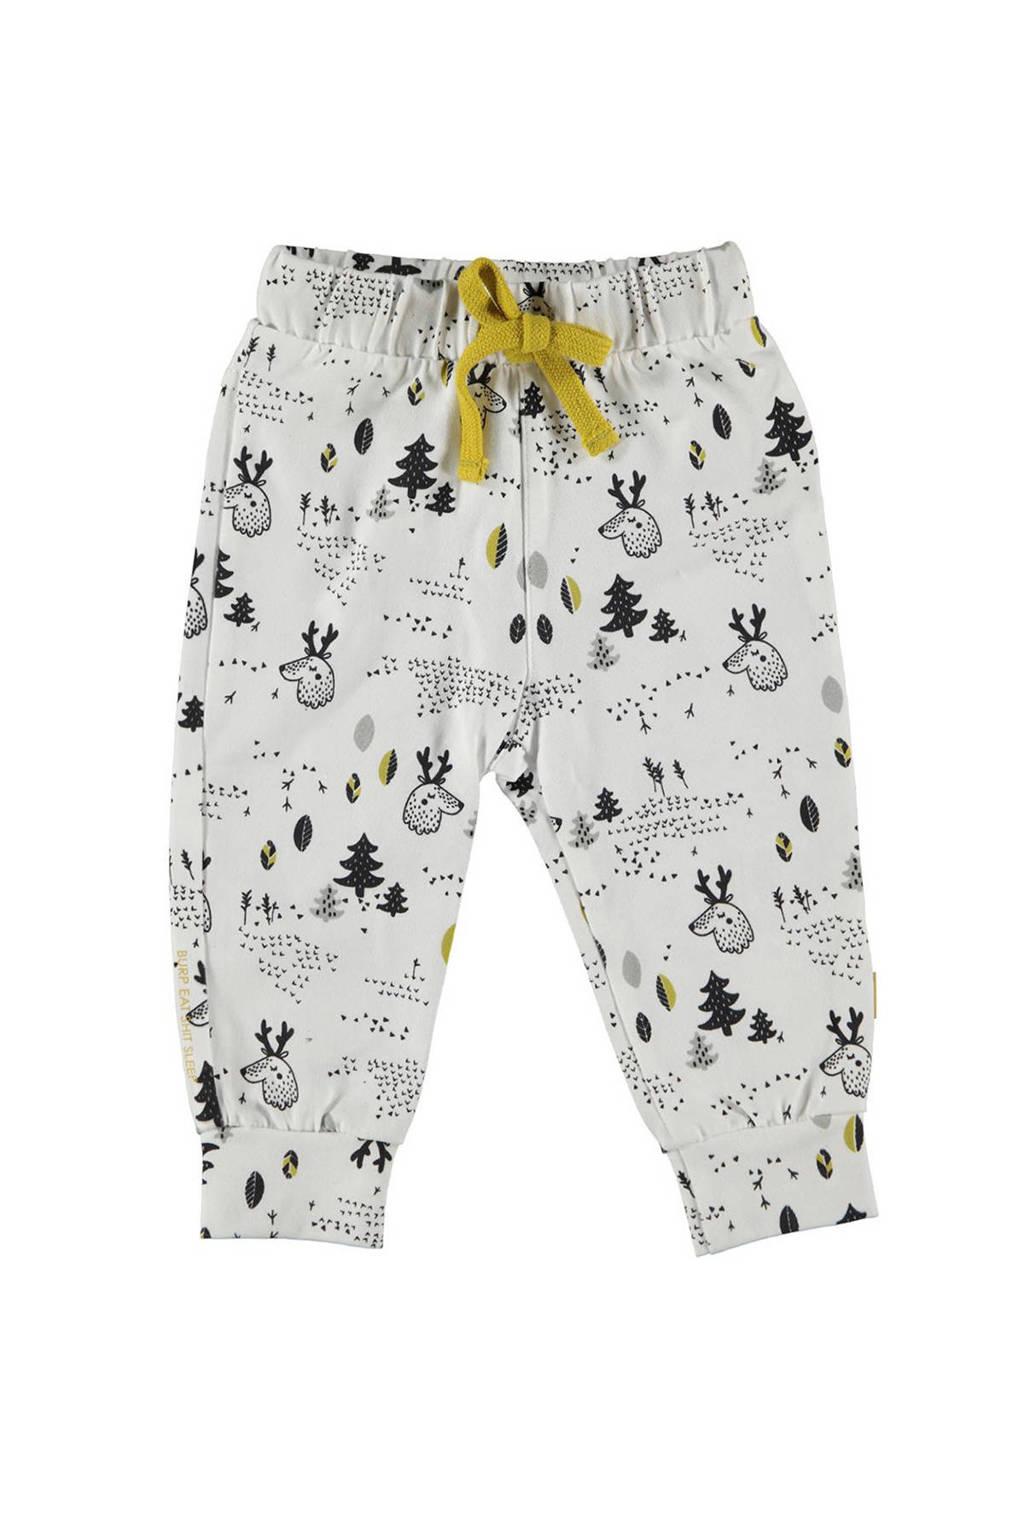 B.E.S.S broek met all over print off white/ zwart/ okergeel/ grijs, Off white/ zwart/ okergeel/ grijs